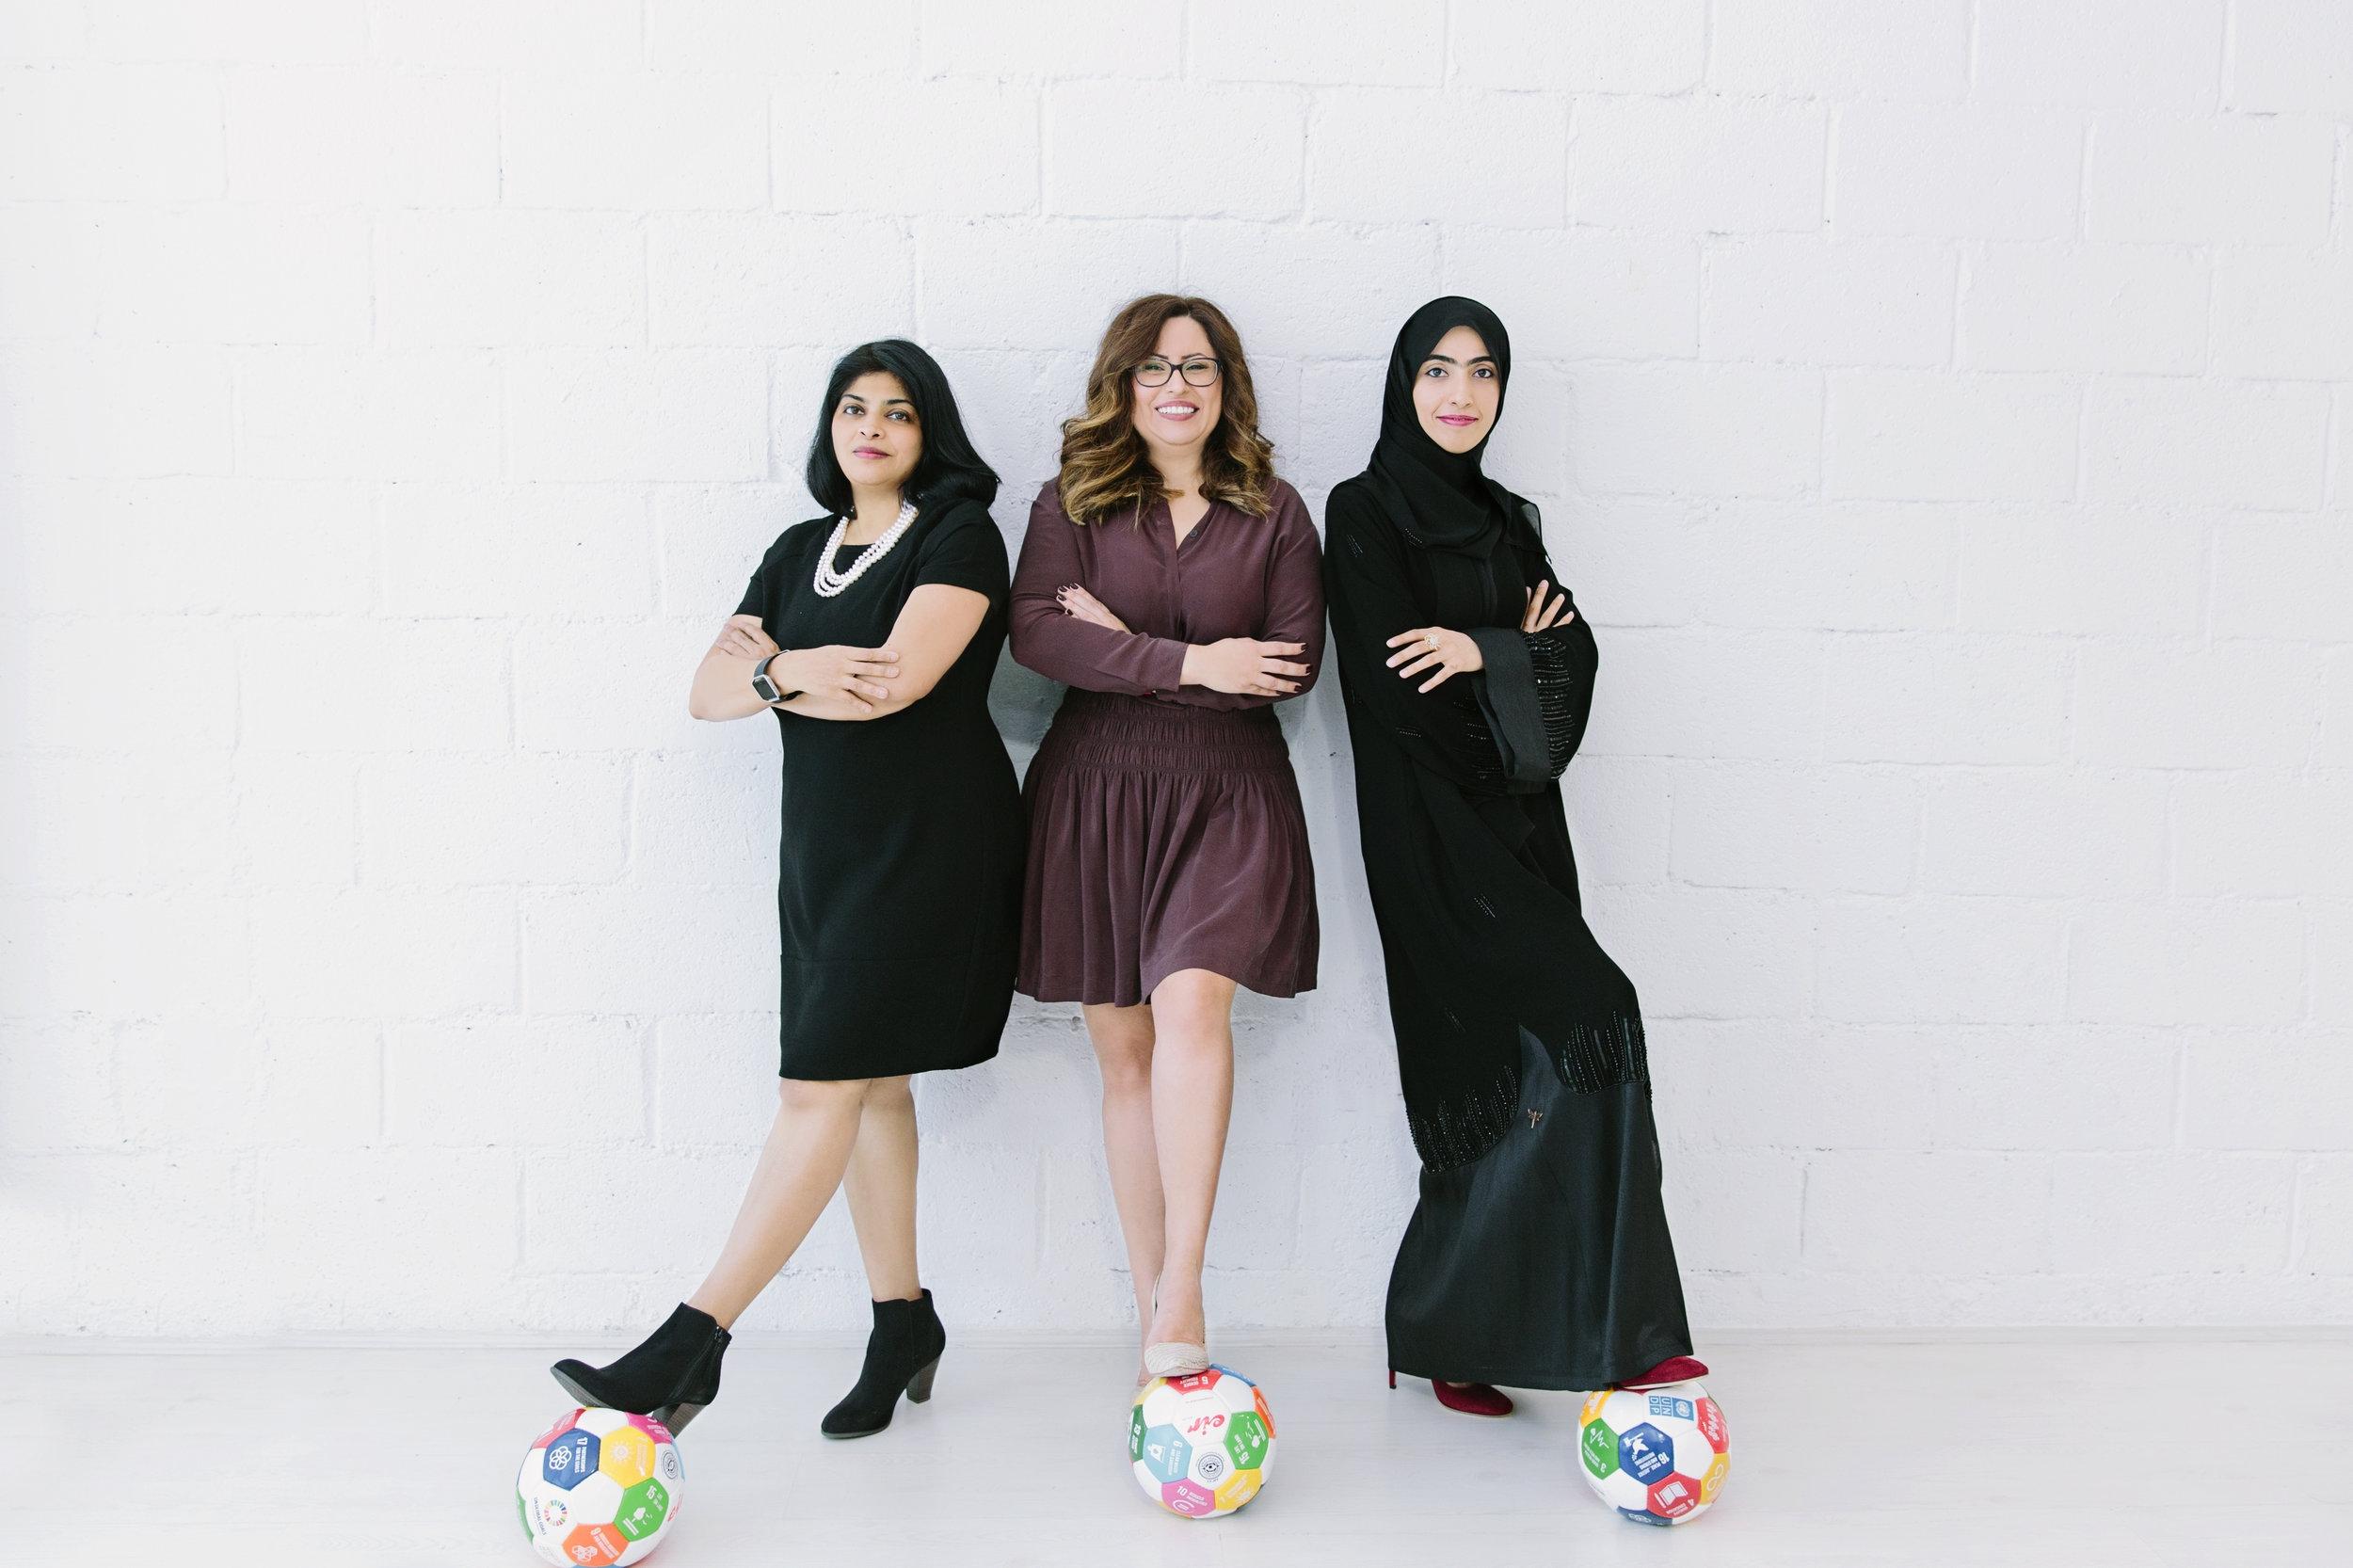 Vineetha Mathew, Dima Maaytah and Noora Mohammad of Dubai based Sustainable Mindz